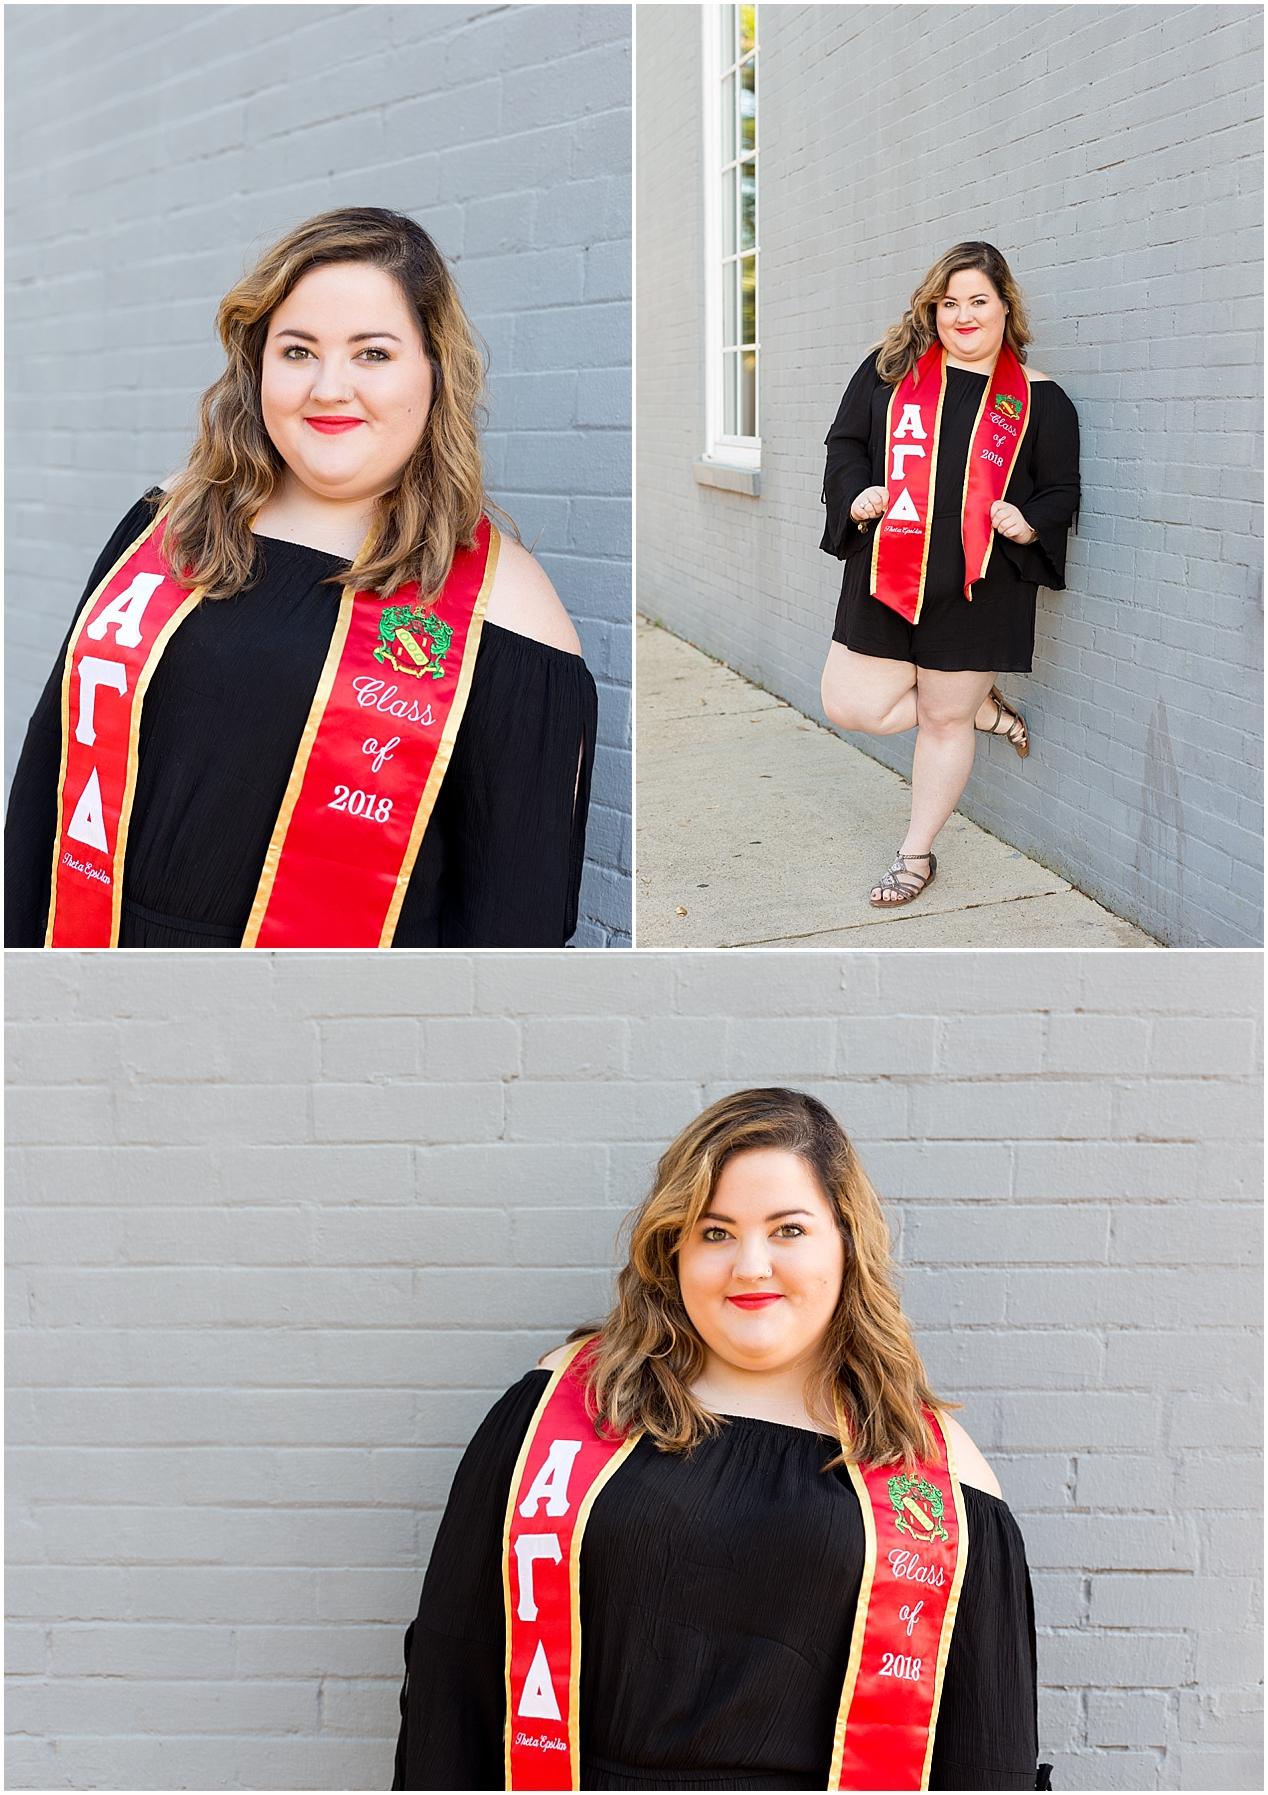 College Graduation Portrait with stole - University of South Alabama Alpha Gamma Delta sorority